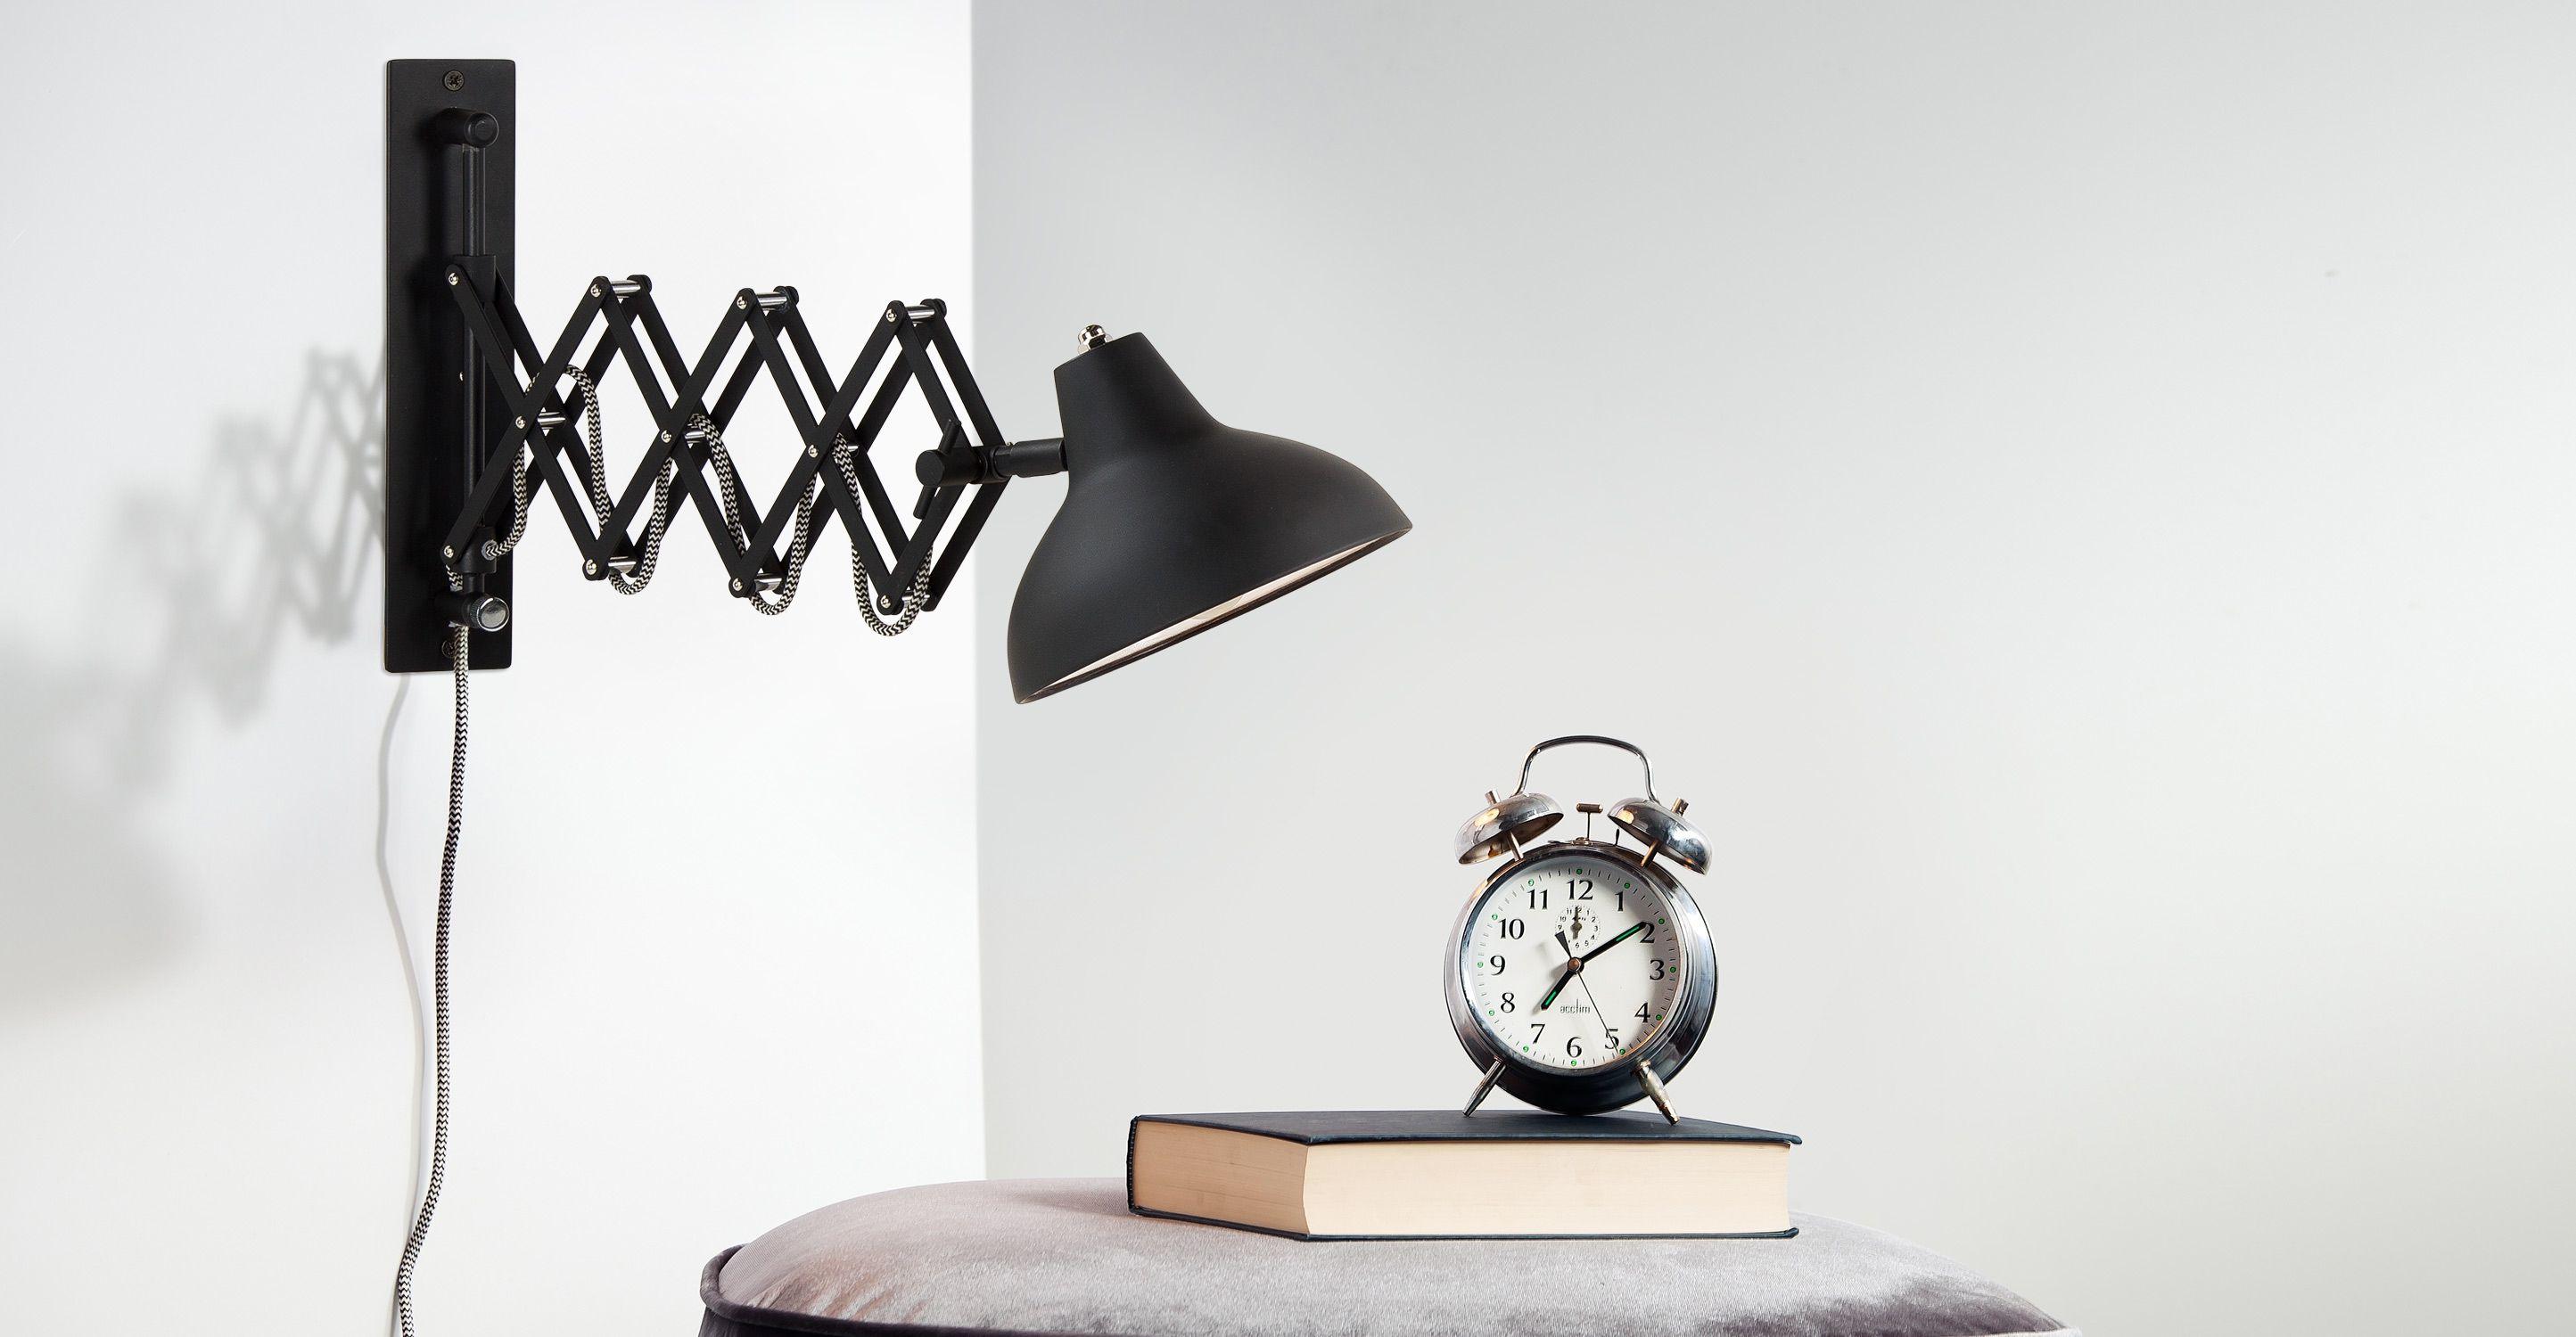 Frosini wandlamp, in zwart   made.com